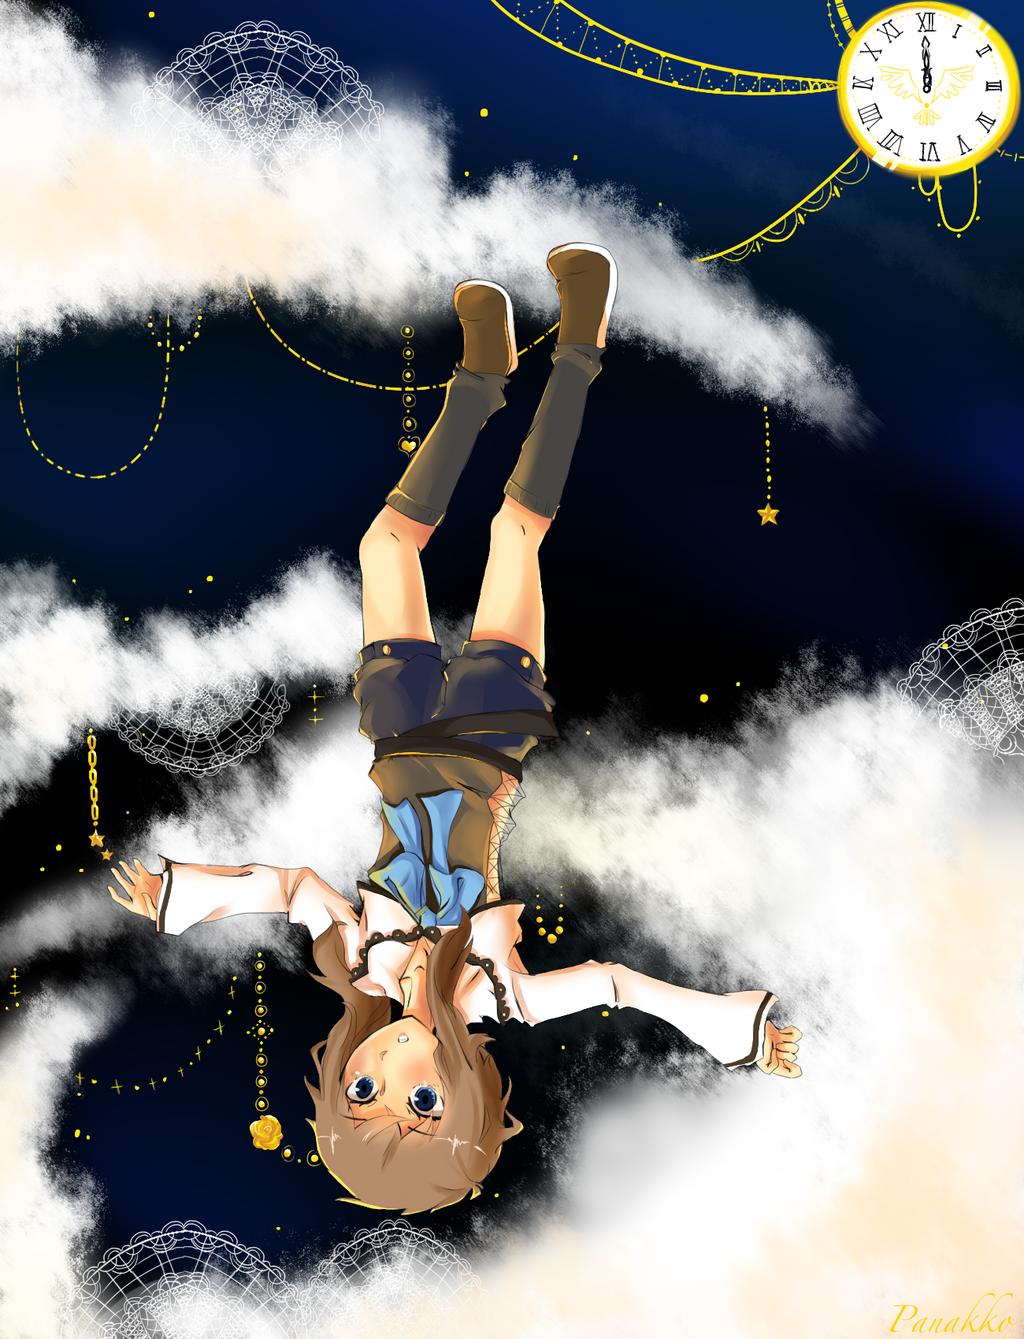 Falling Down (Anime) - Anime, Manga und asiatische Filme ...